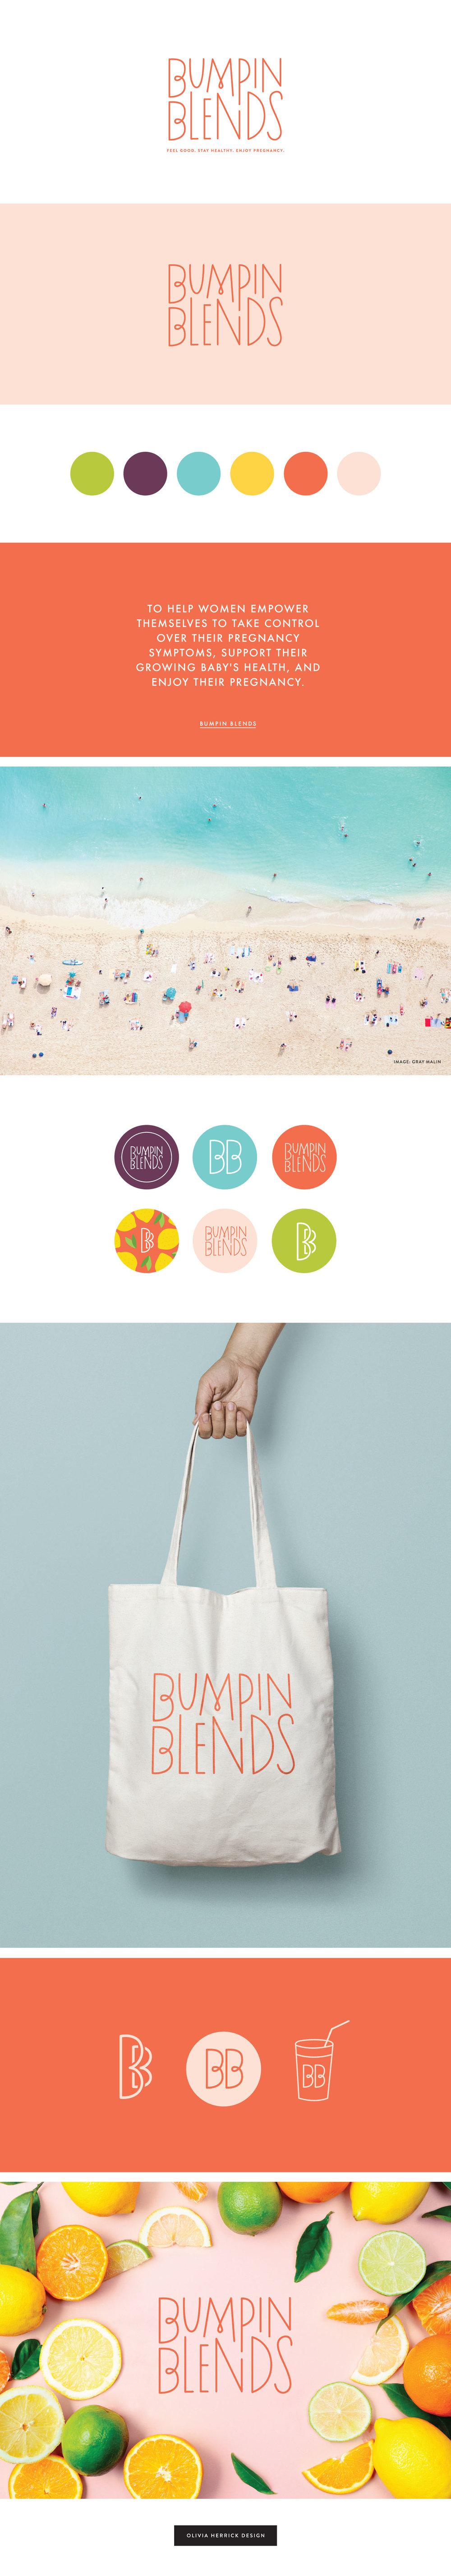 bumpin-blends-olivia-herrick-design.jpg